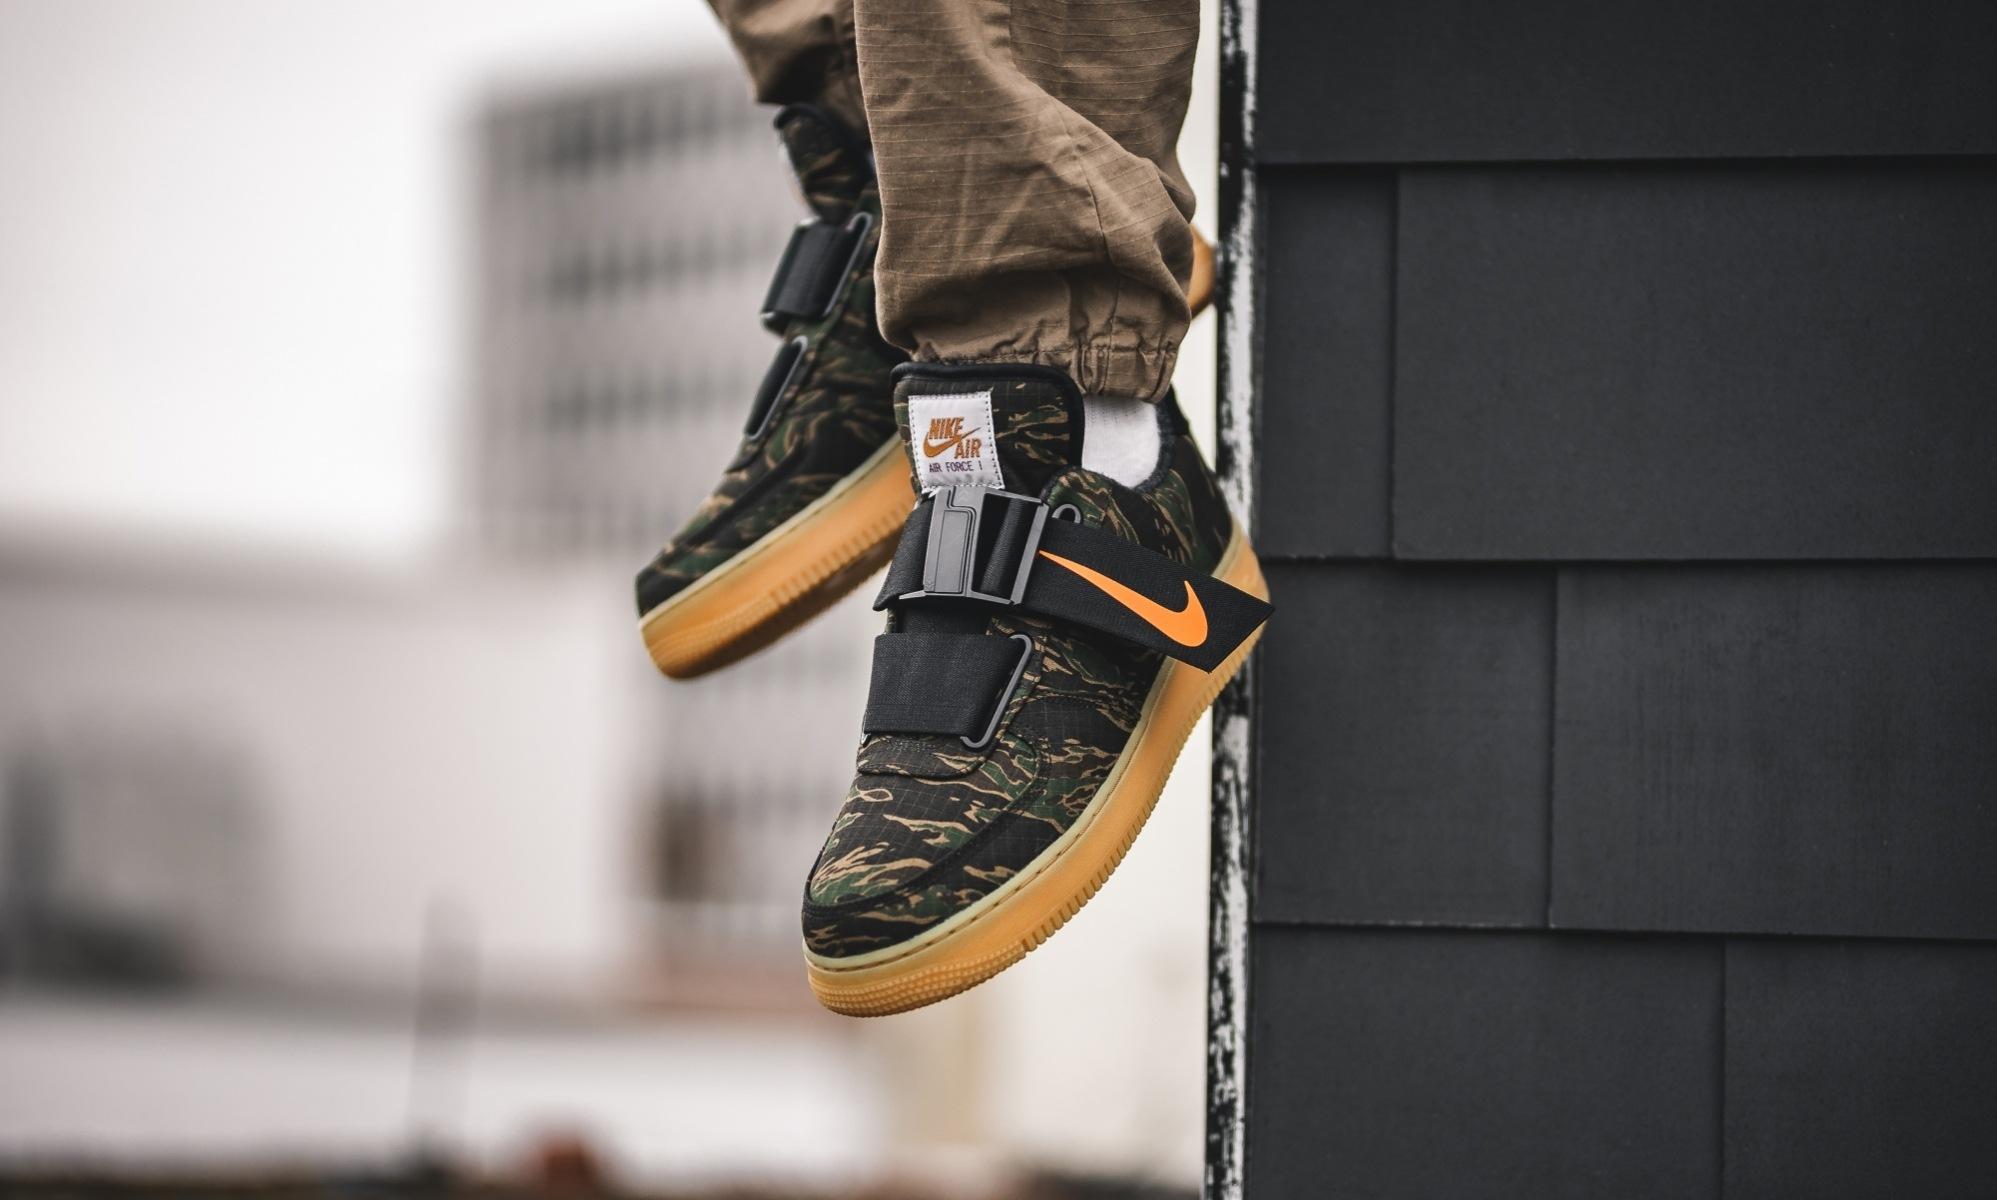 Carhartt x Nike Air Force 1 Low Utility Camo Green